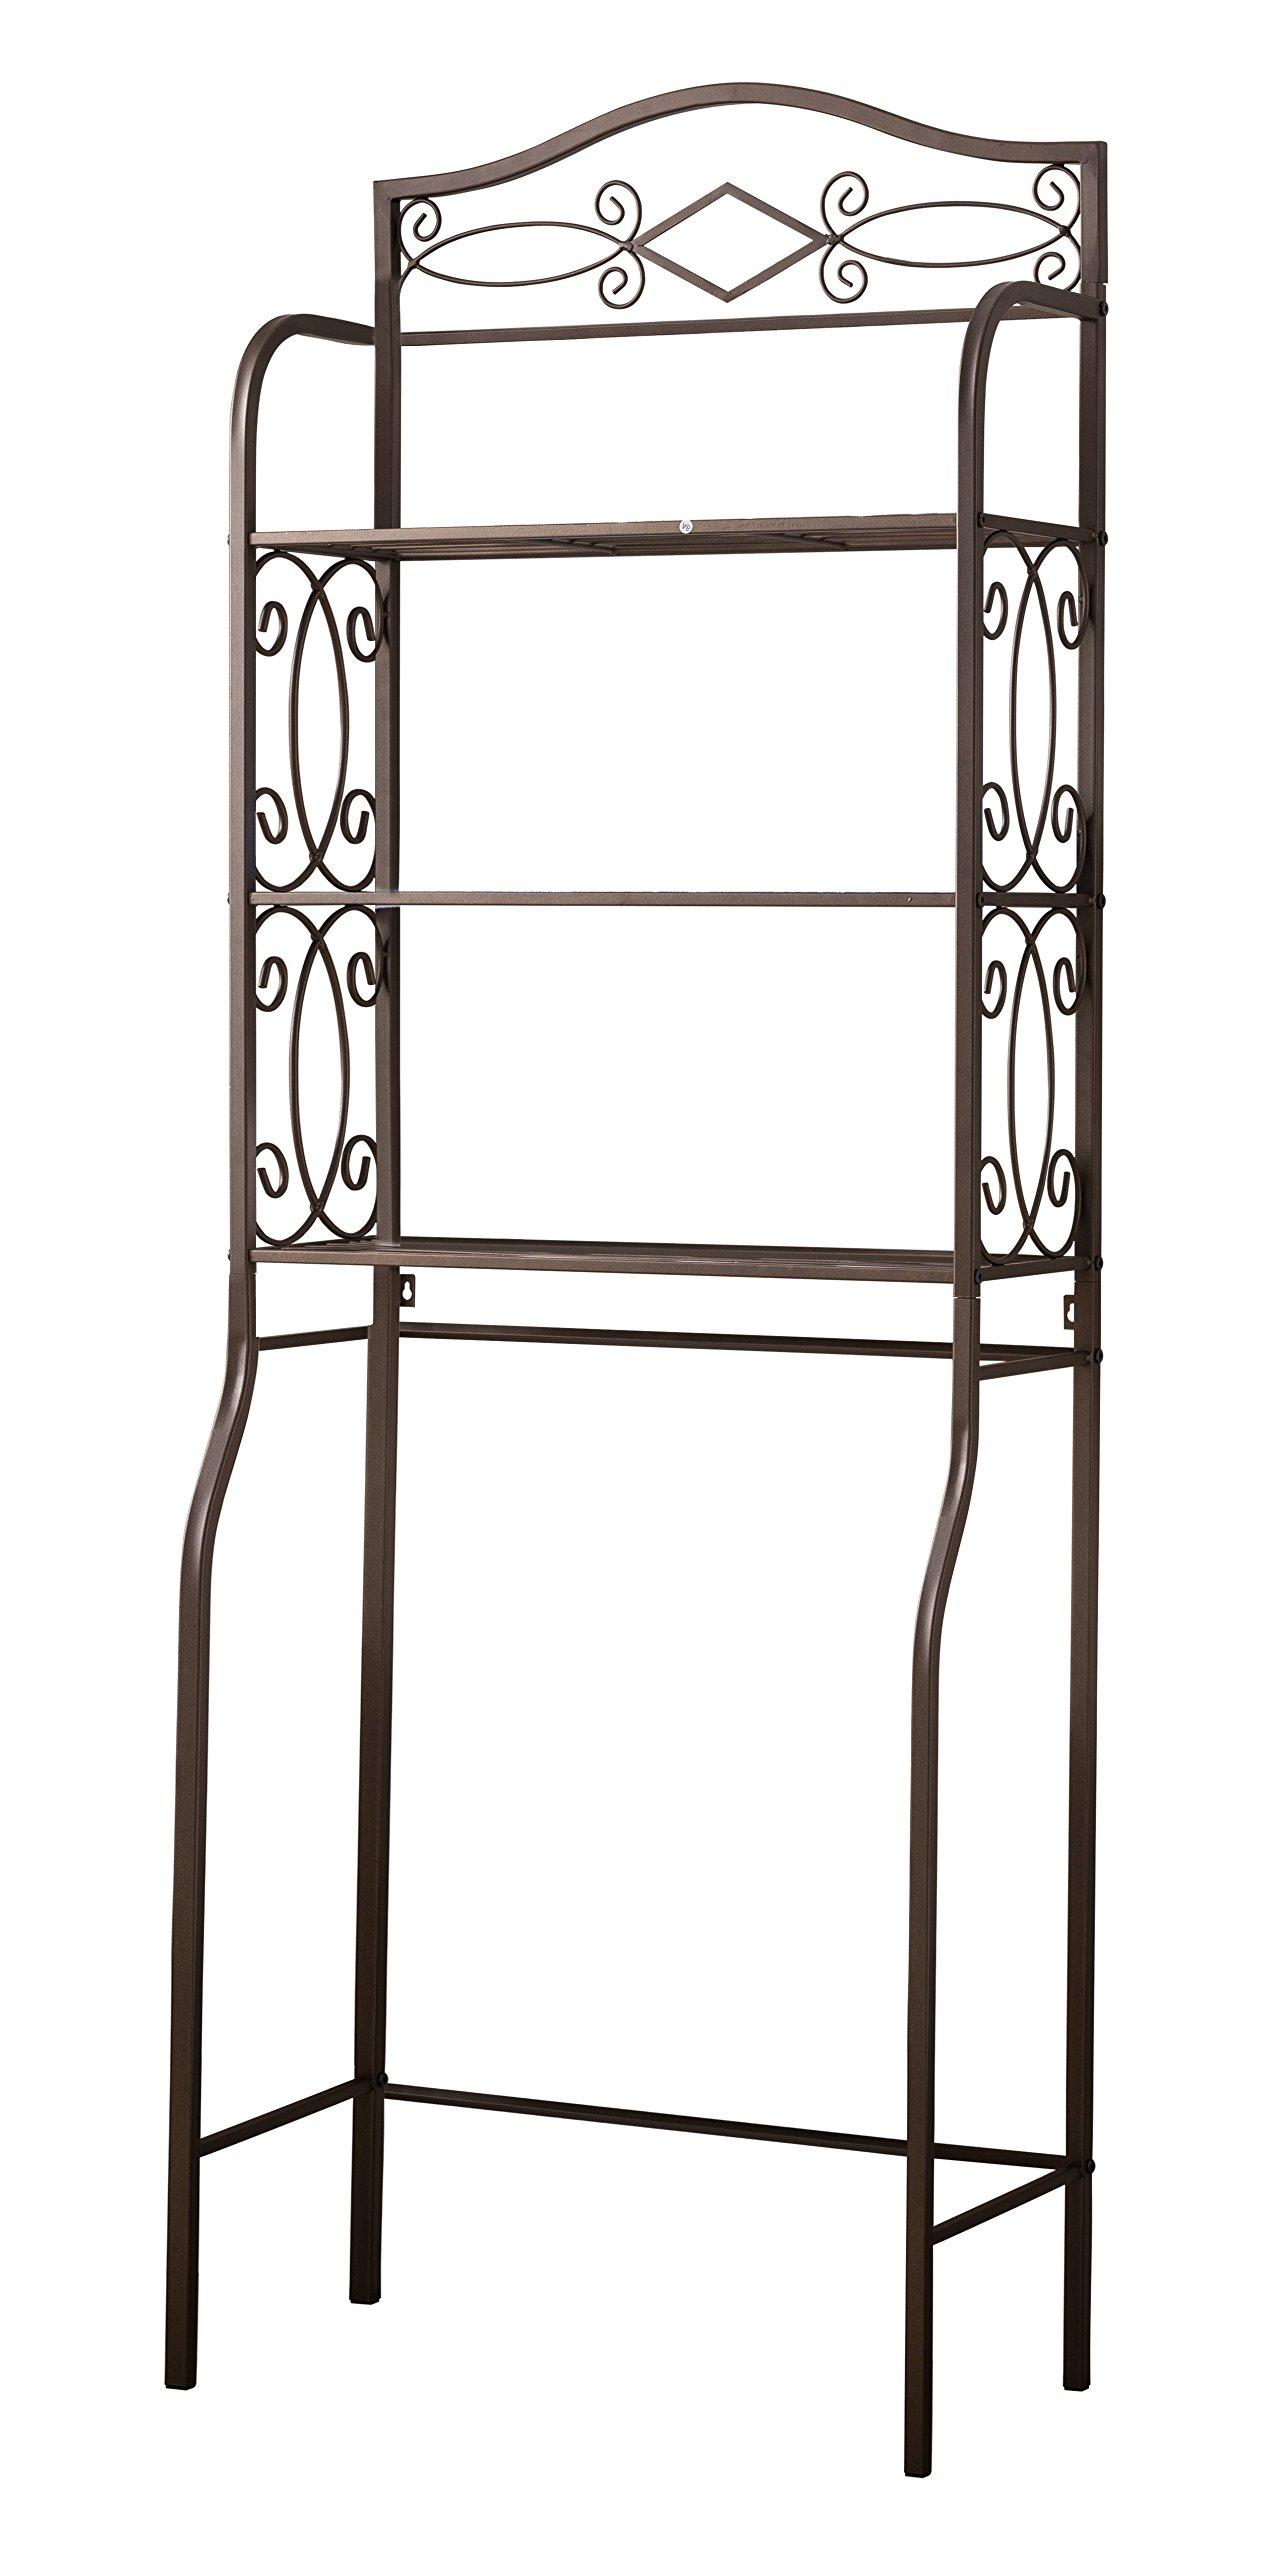 kings brand over the toilet storage etagere bathroom rack shelves organizer 802319021482 ebay. Black Bedroom Furniture Sets. Home Design Ideas